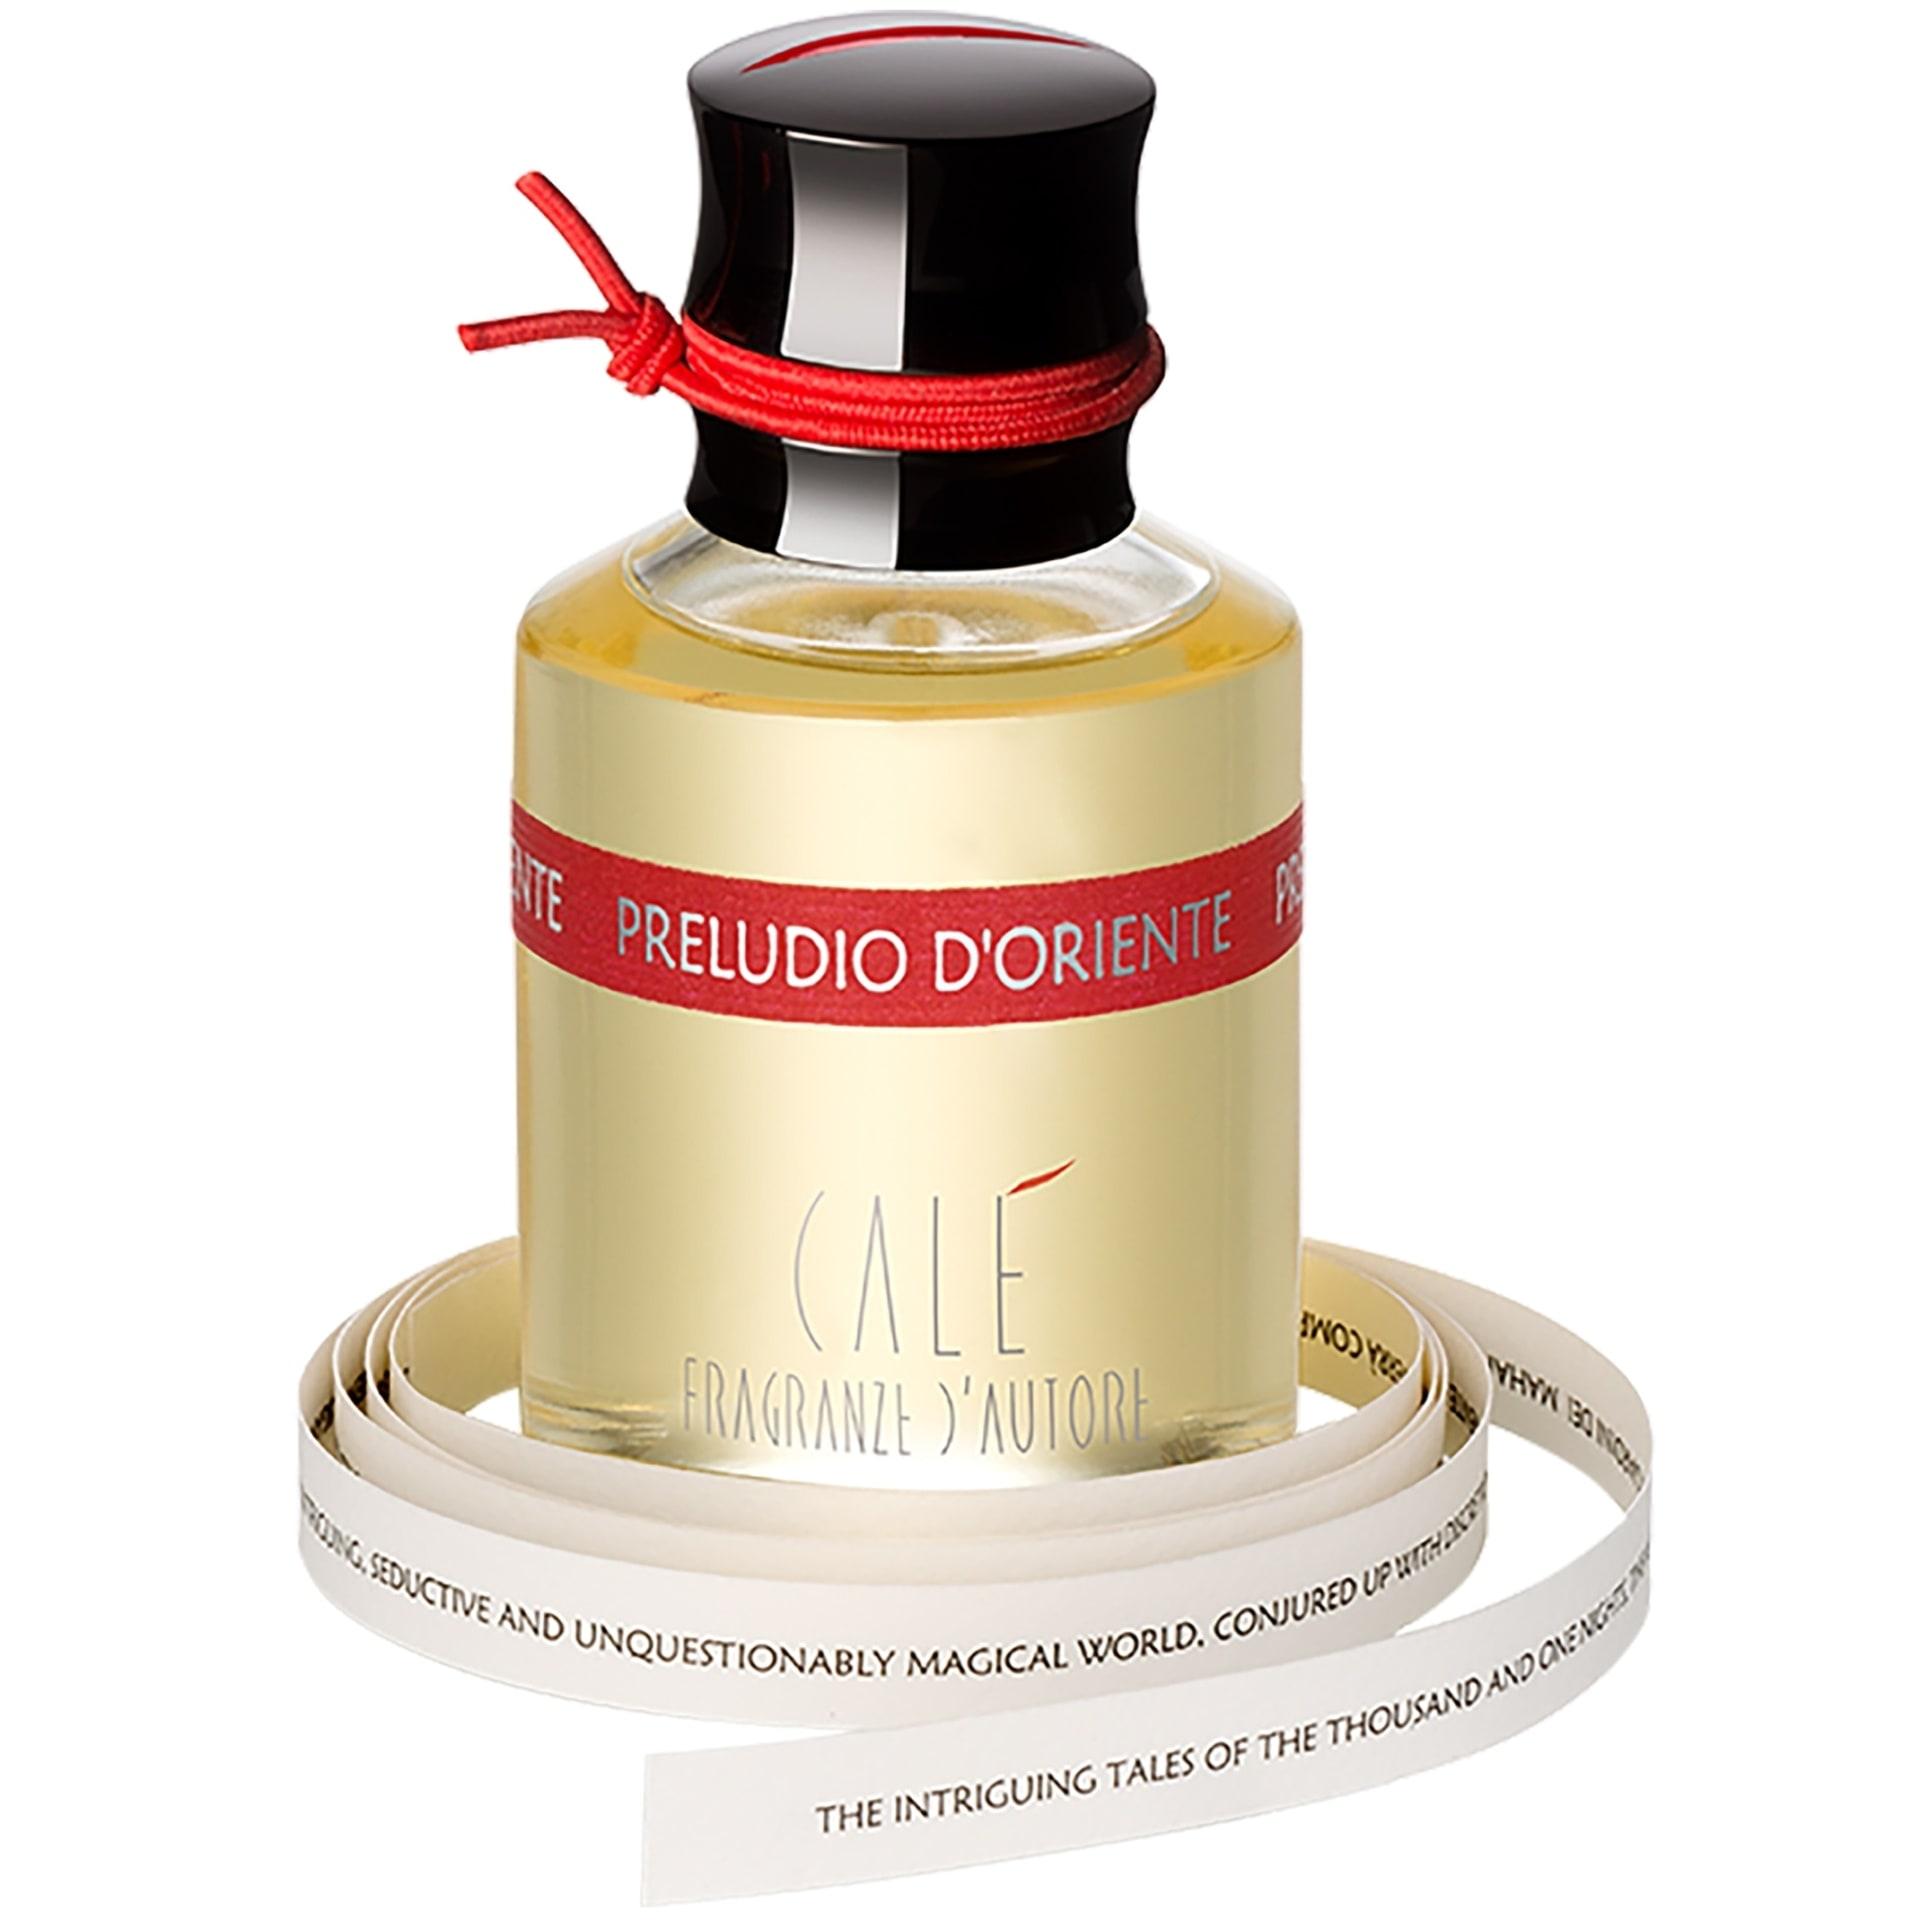 cale-fragranze-dautore-preludio-d-oriente-3